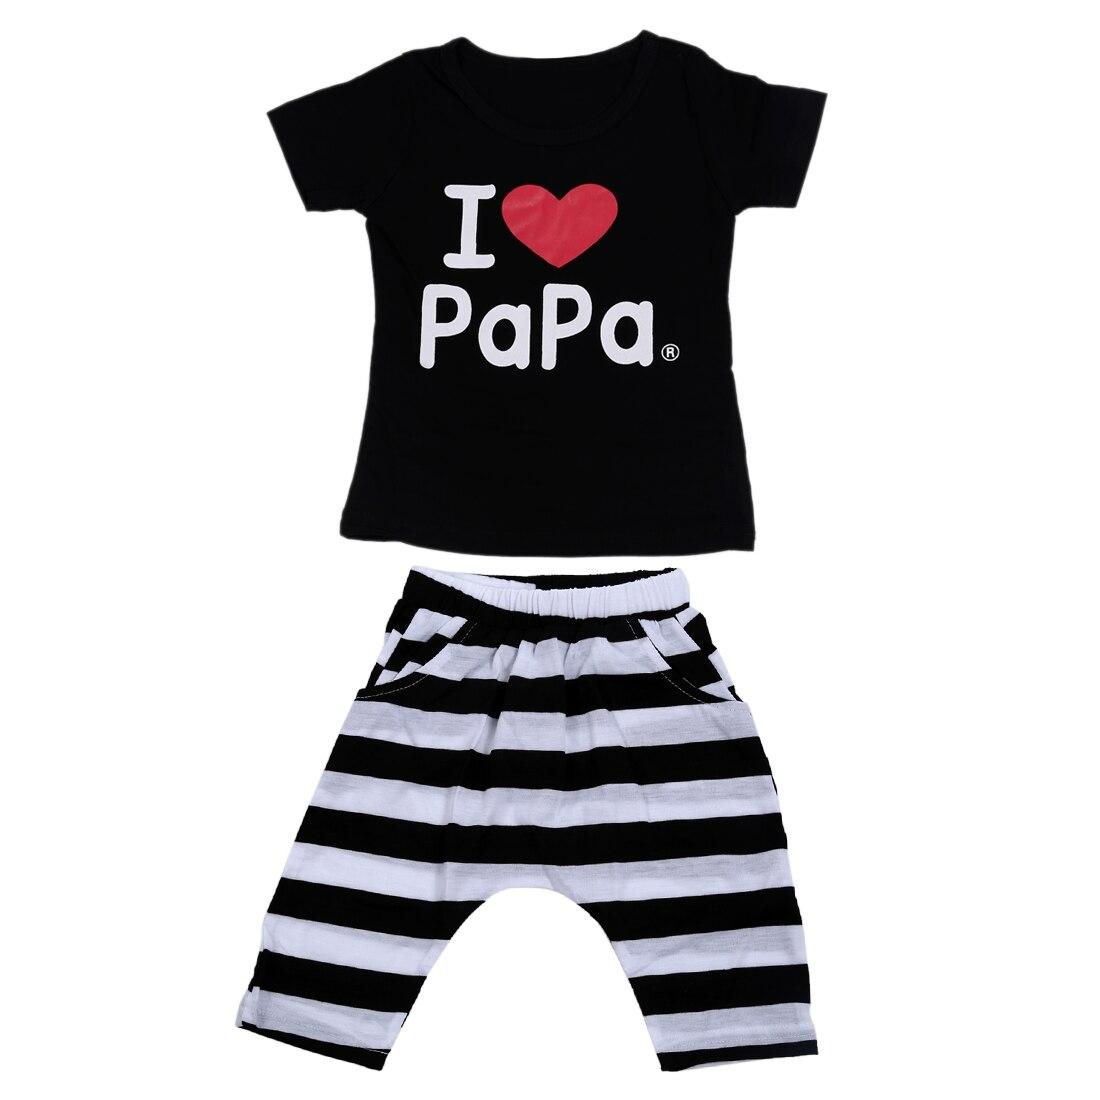 Hot Sale Baby clothing set cotton suit I Love Papa letters Short-sleeved T-shirt + striped pants black I LOVE PAPA 90-130CM